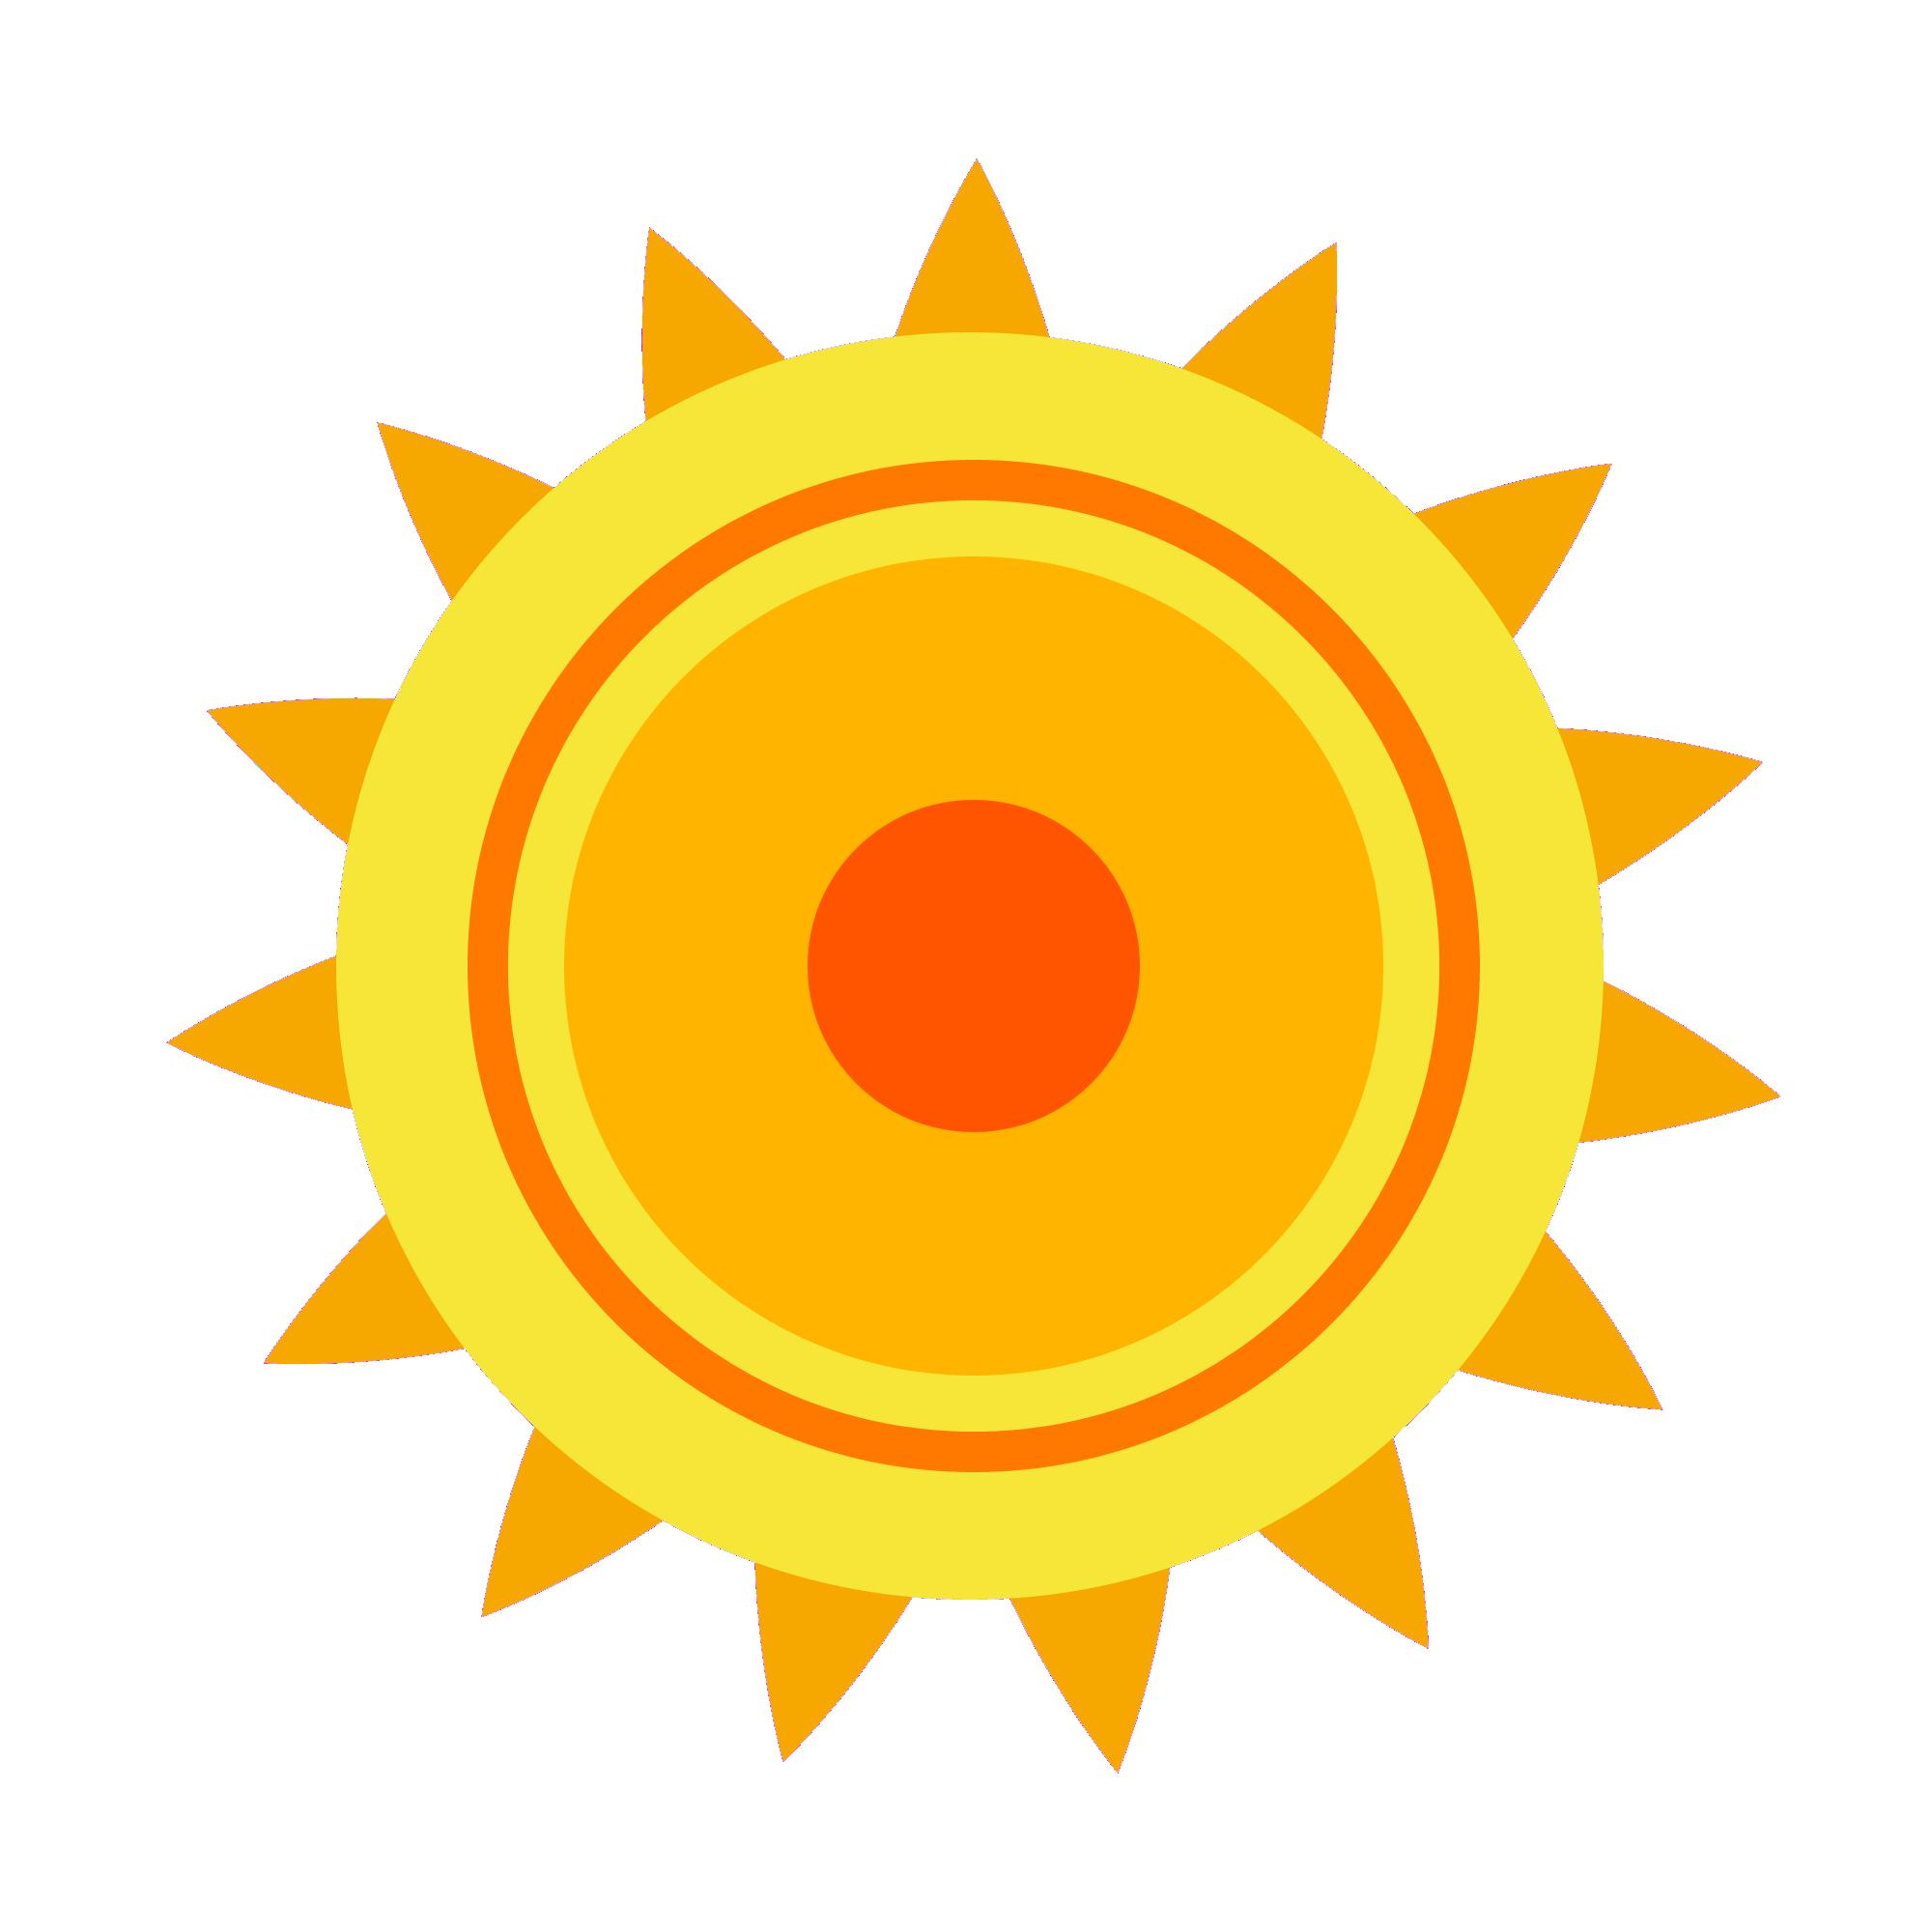 Cool sun clipart image library Sun Glitter Gifs - Hanslodge Cliparts image library